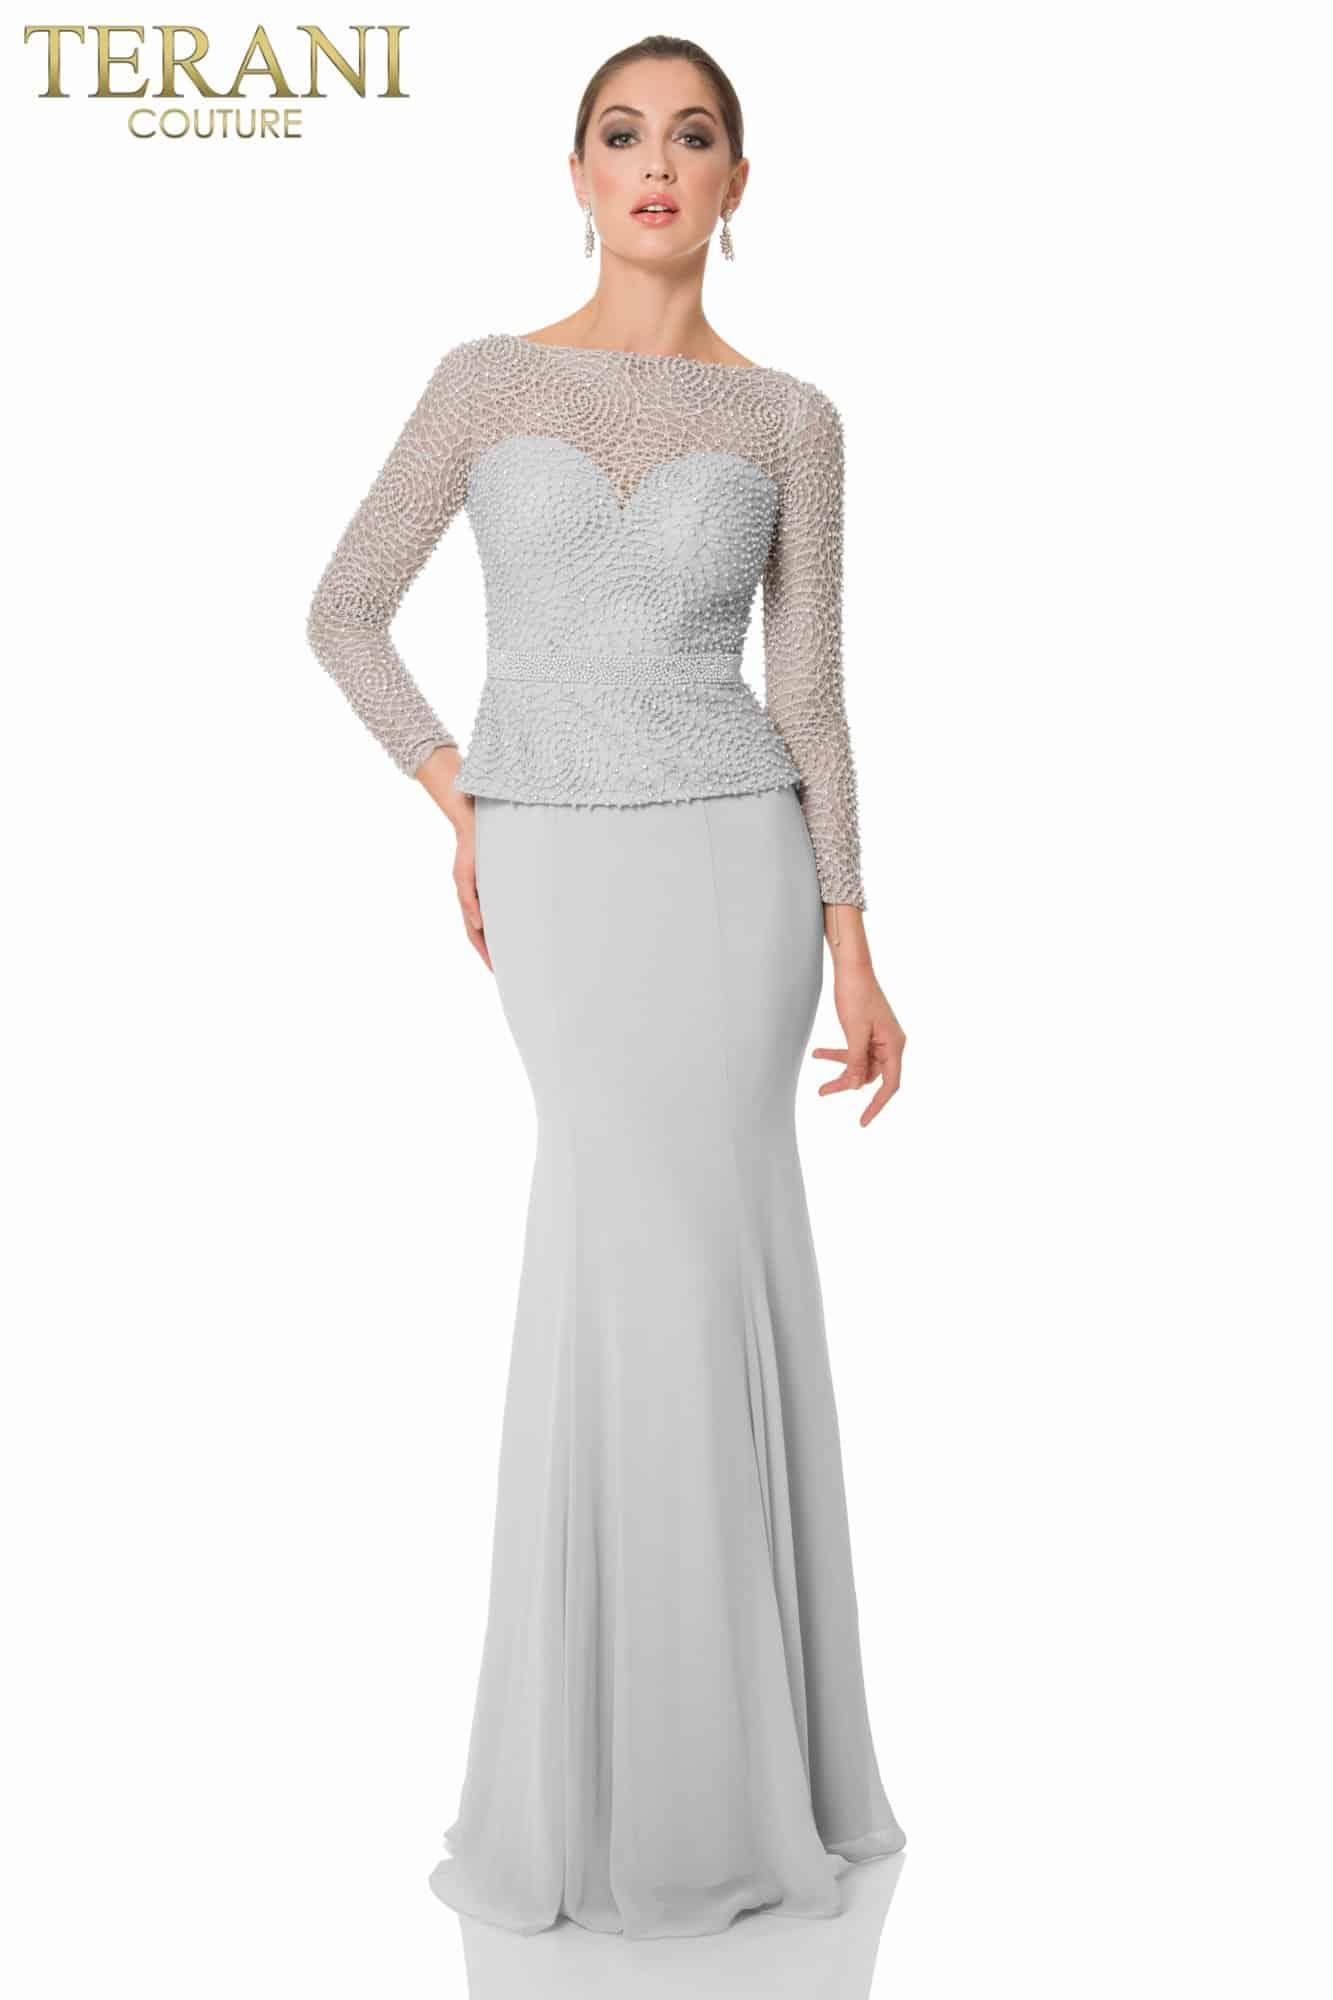 Best White Wedding Reception Dresses 2016-2017 | Short, Long